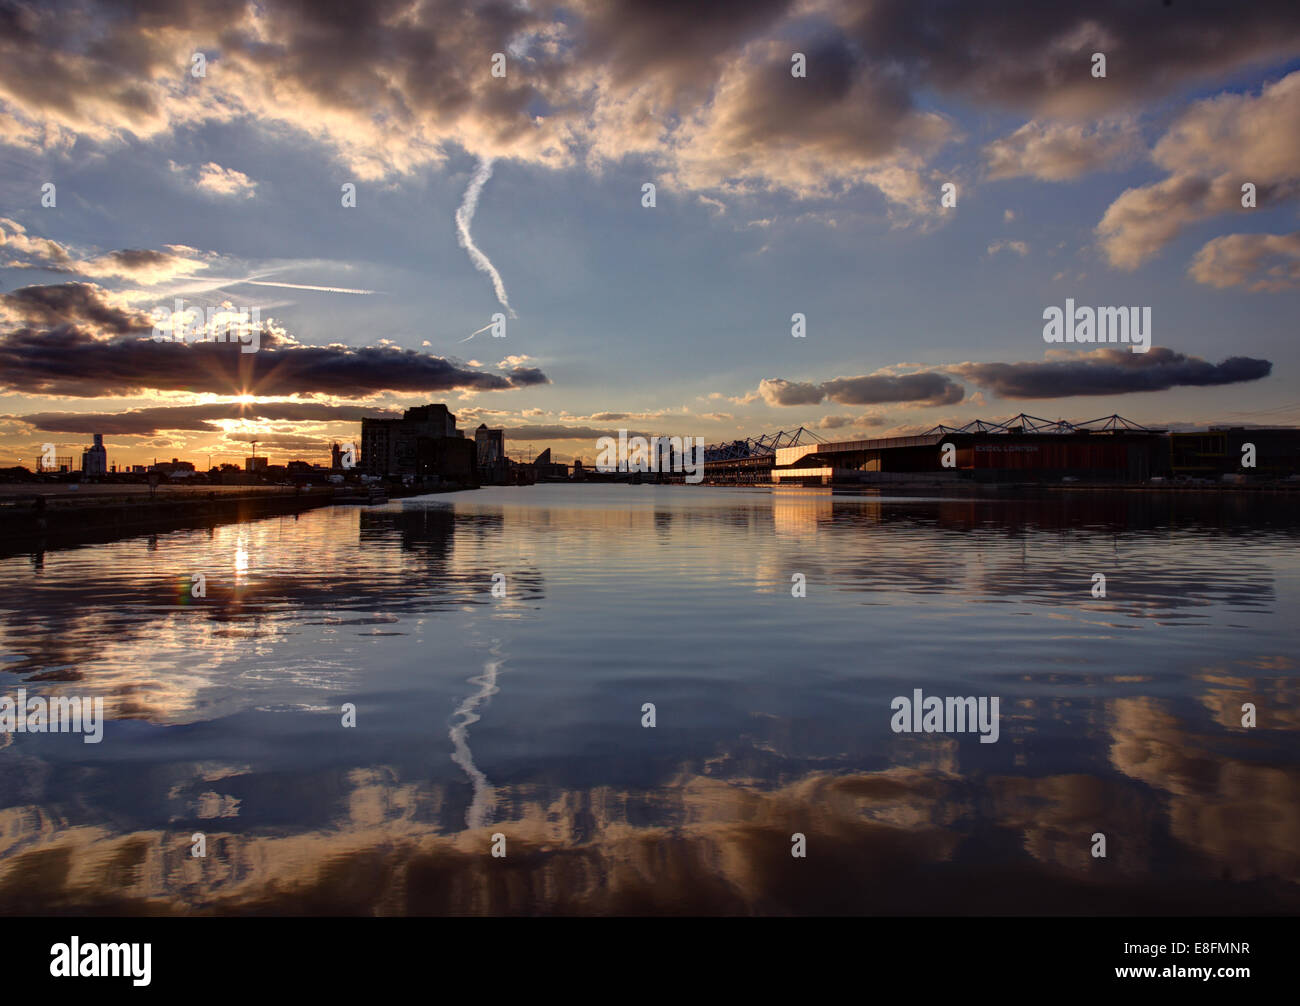 United Kingdom, England, London, Royal Victoria Docks in Canary Wharf Stockbild